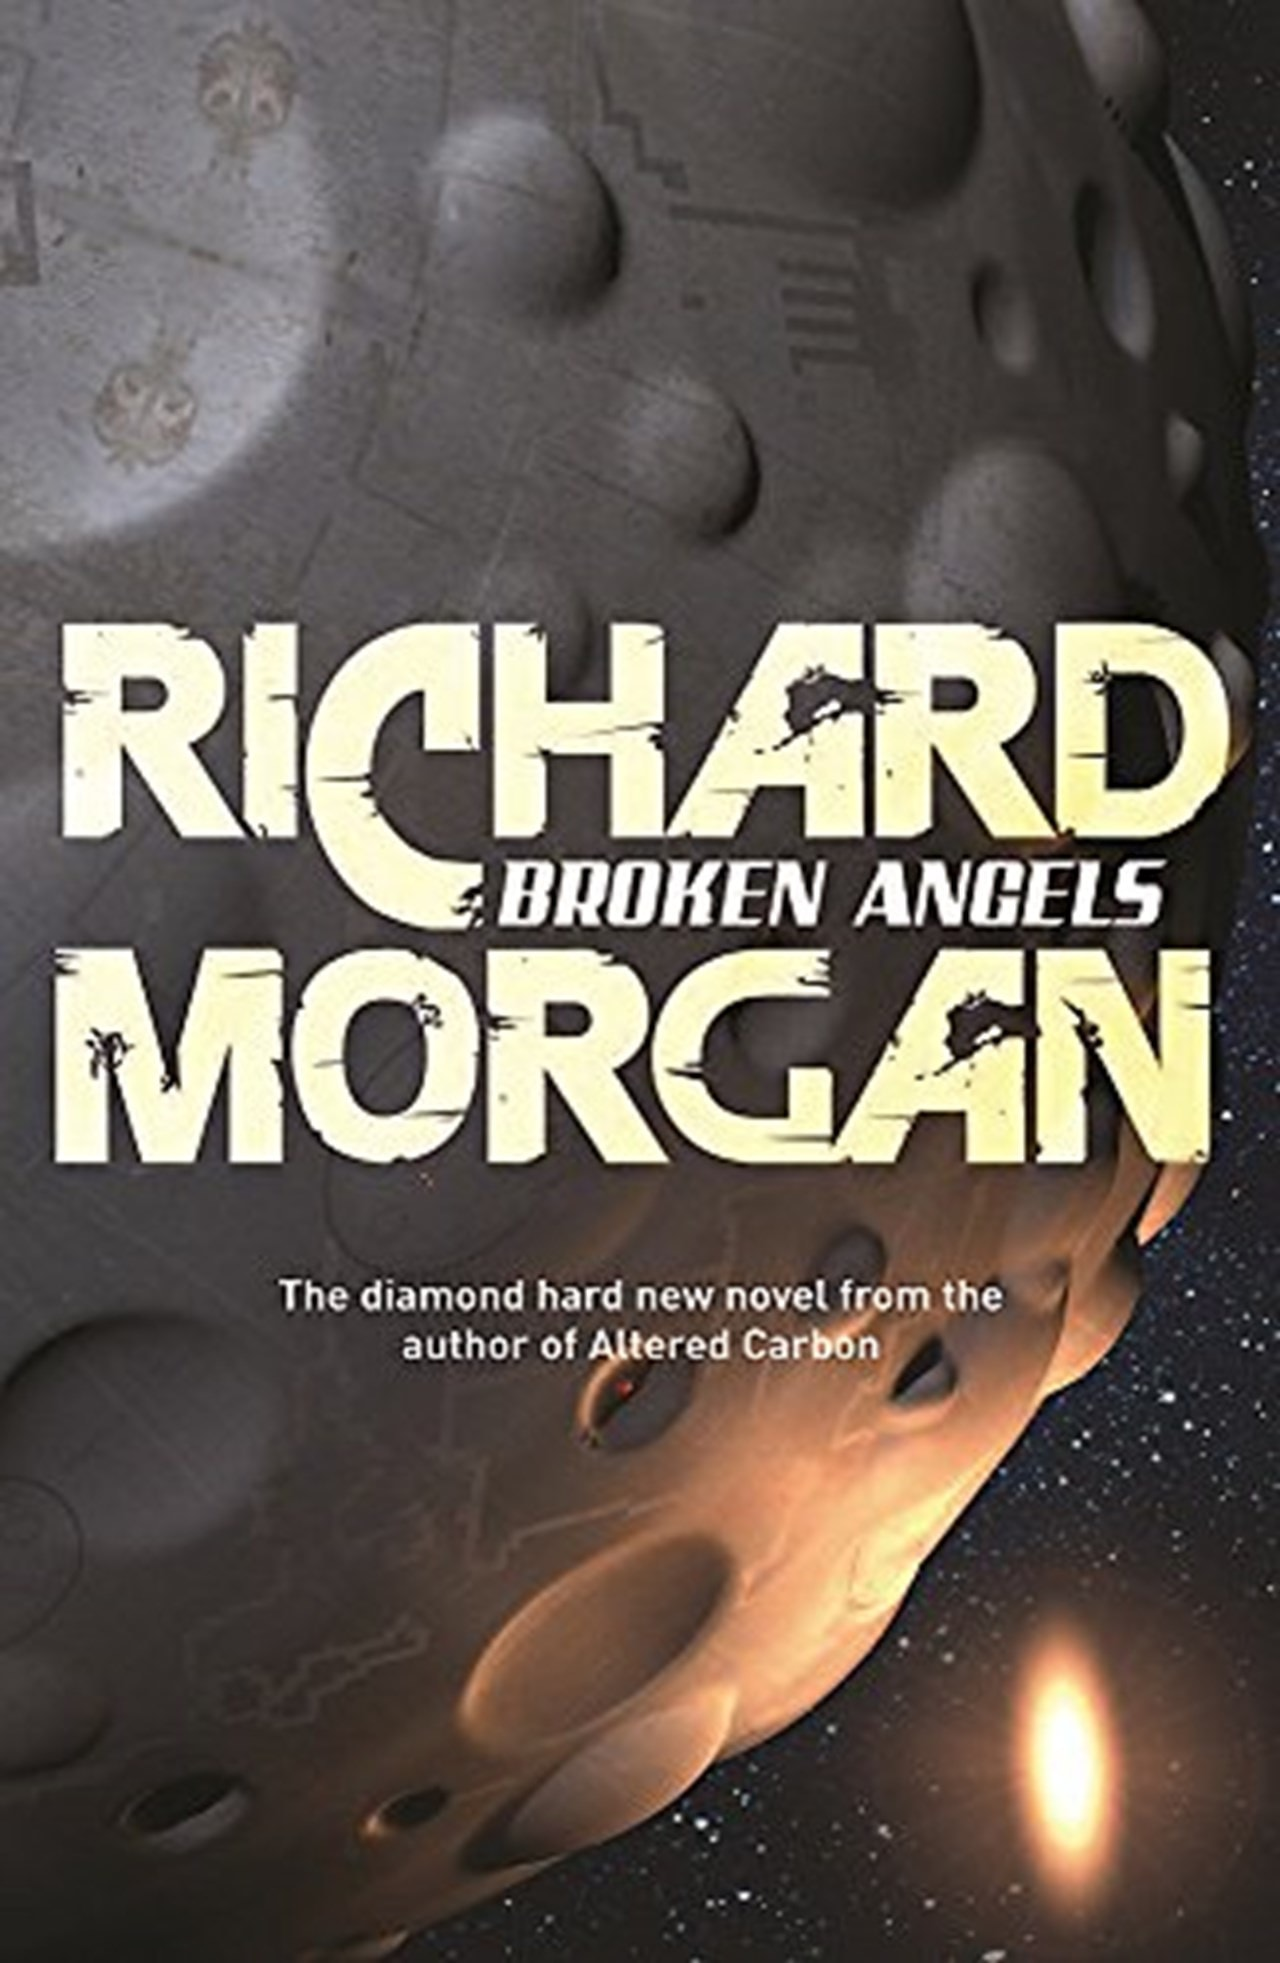 Broken Angels: A Novel - 1